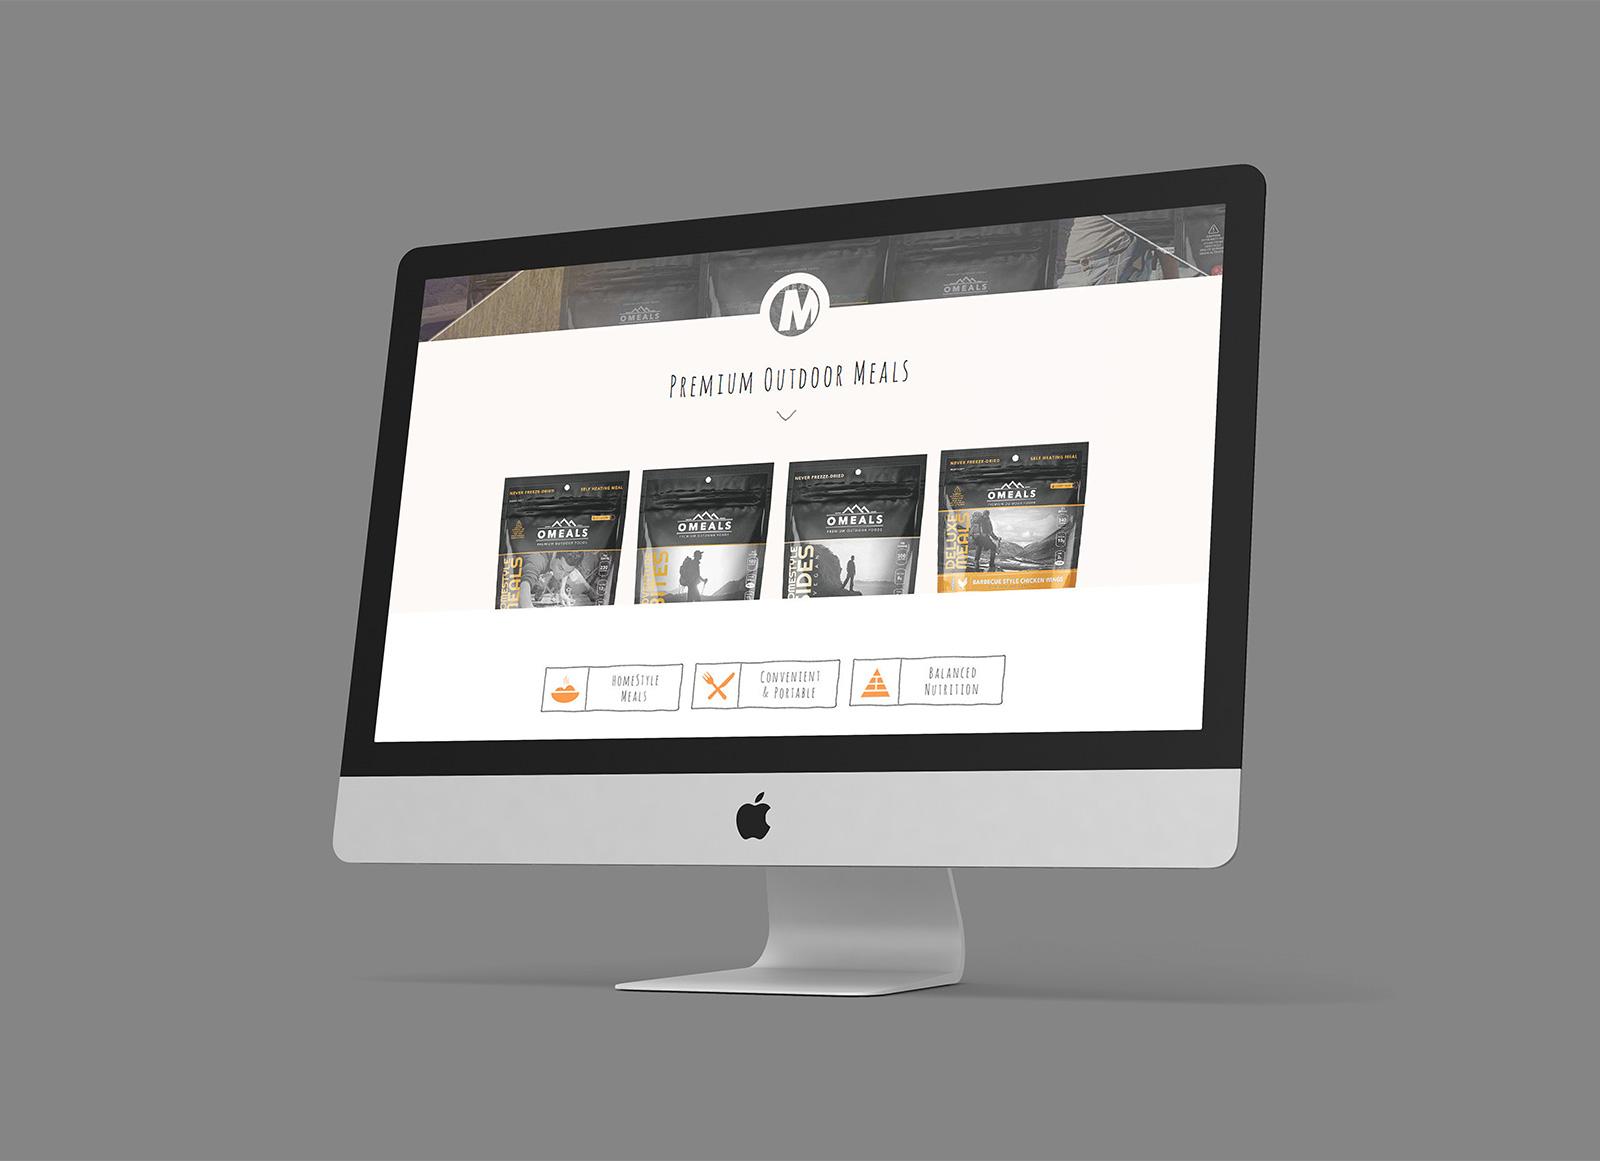 Free-Apple-iMac-Mockup-PSD-(1)